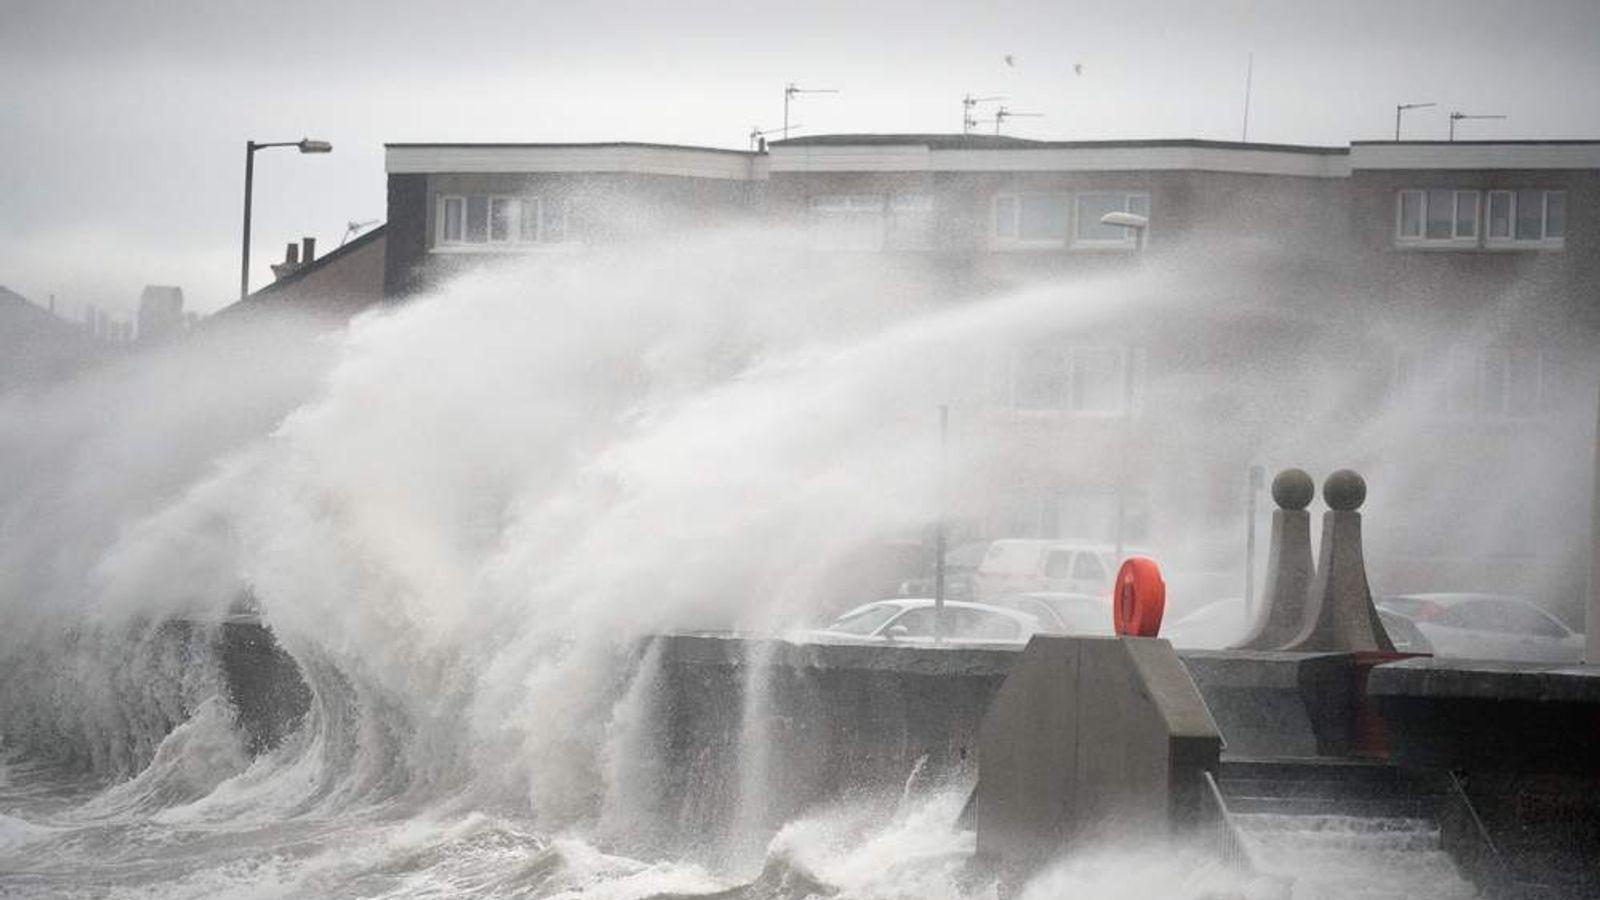 Gales and Heavy Rain Threaten The Festive Getaway